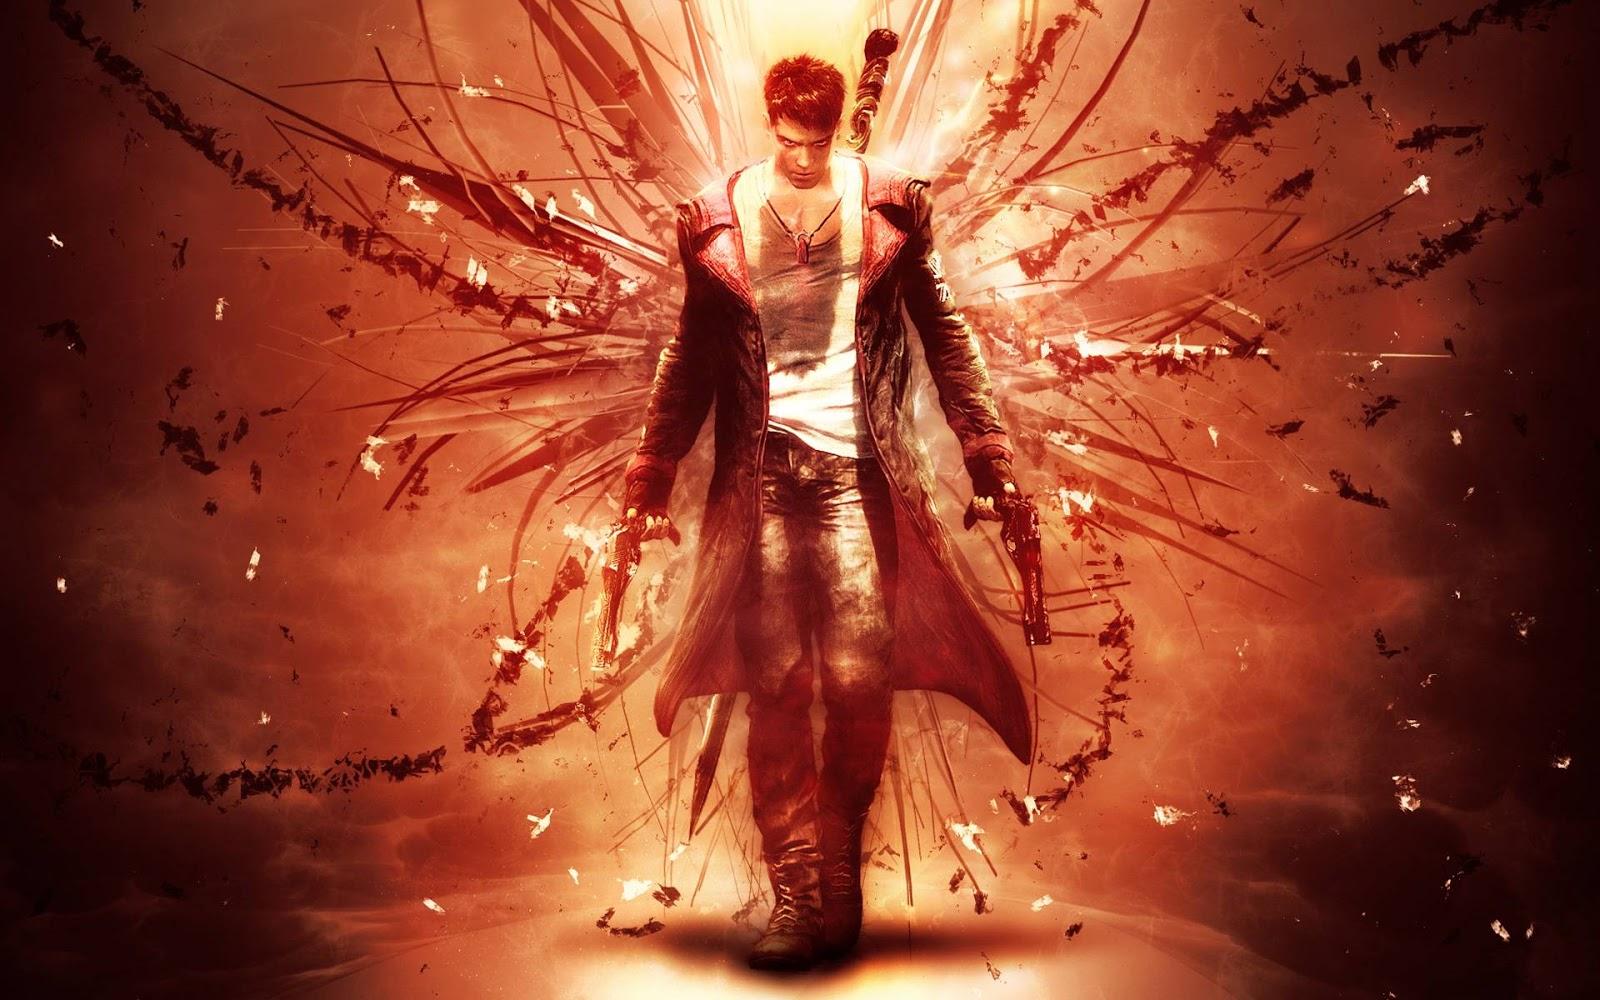 http://2.bp.blogspot.com/-mWmDKN6jVr8/UPrs8_36zjI/AAAAAAAAAQk/8YGXFJhIVu4/s1600/dmc-devil-may-cry-wallpaper-in-hd.jpg